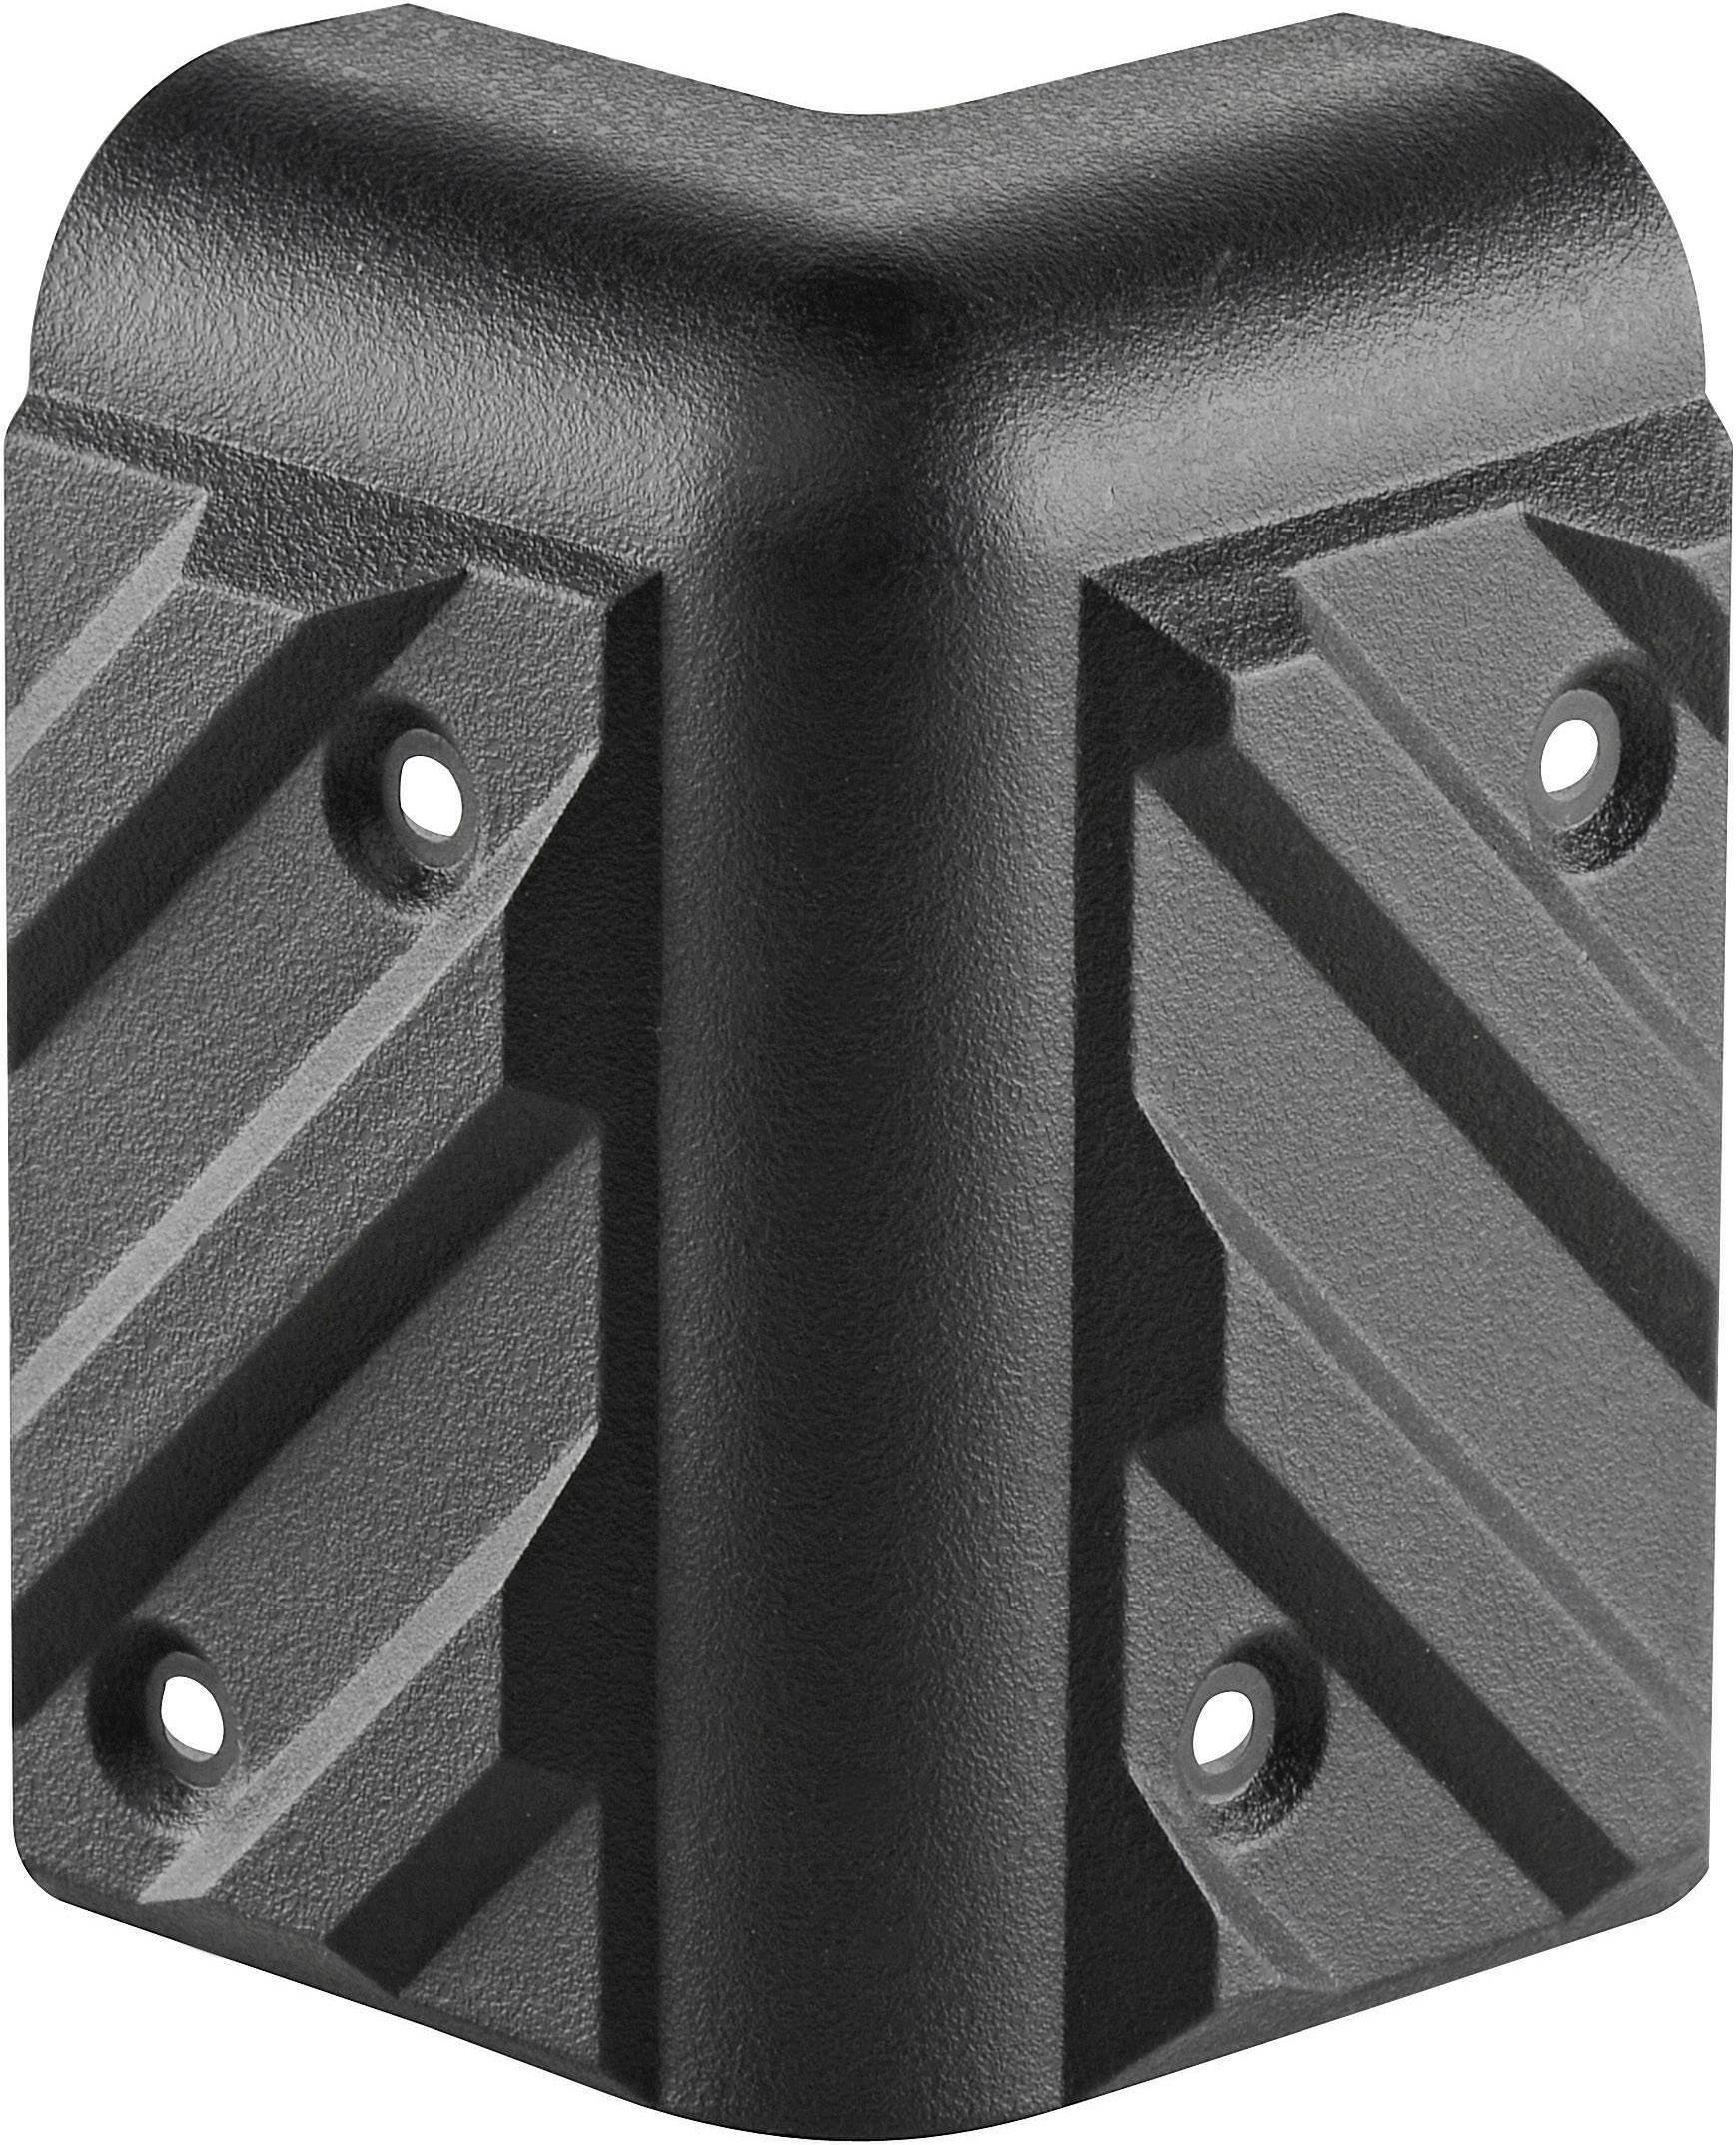 Ochranní roh na reproboxy 8270, (d x š) 80 mm x 47 mm, plast